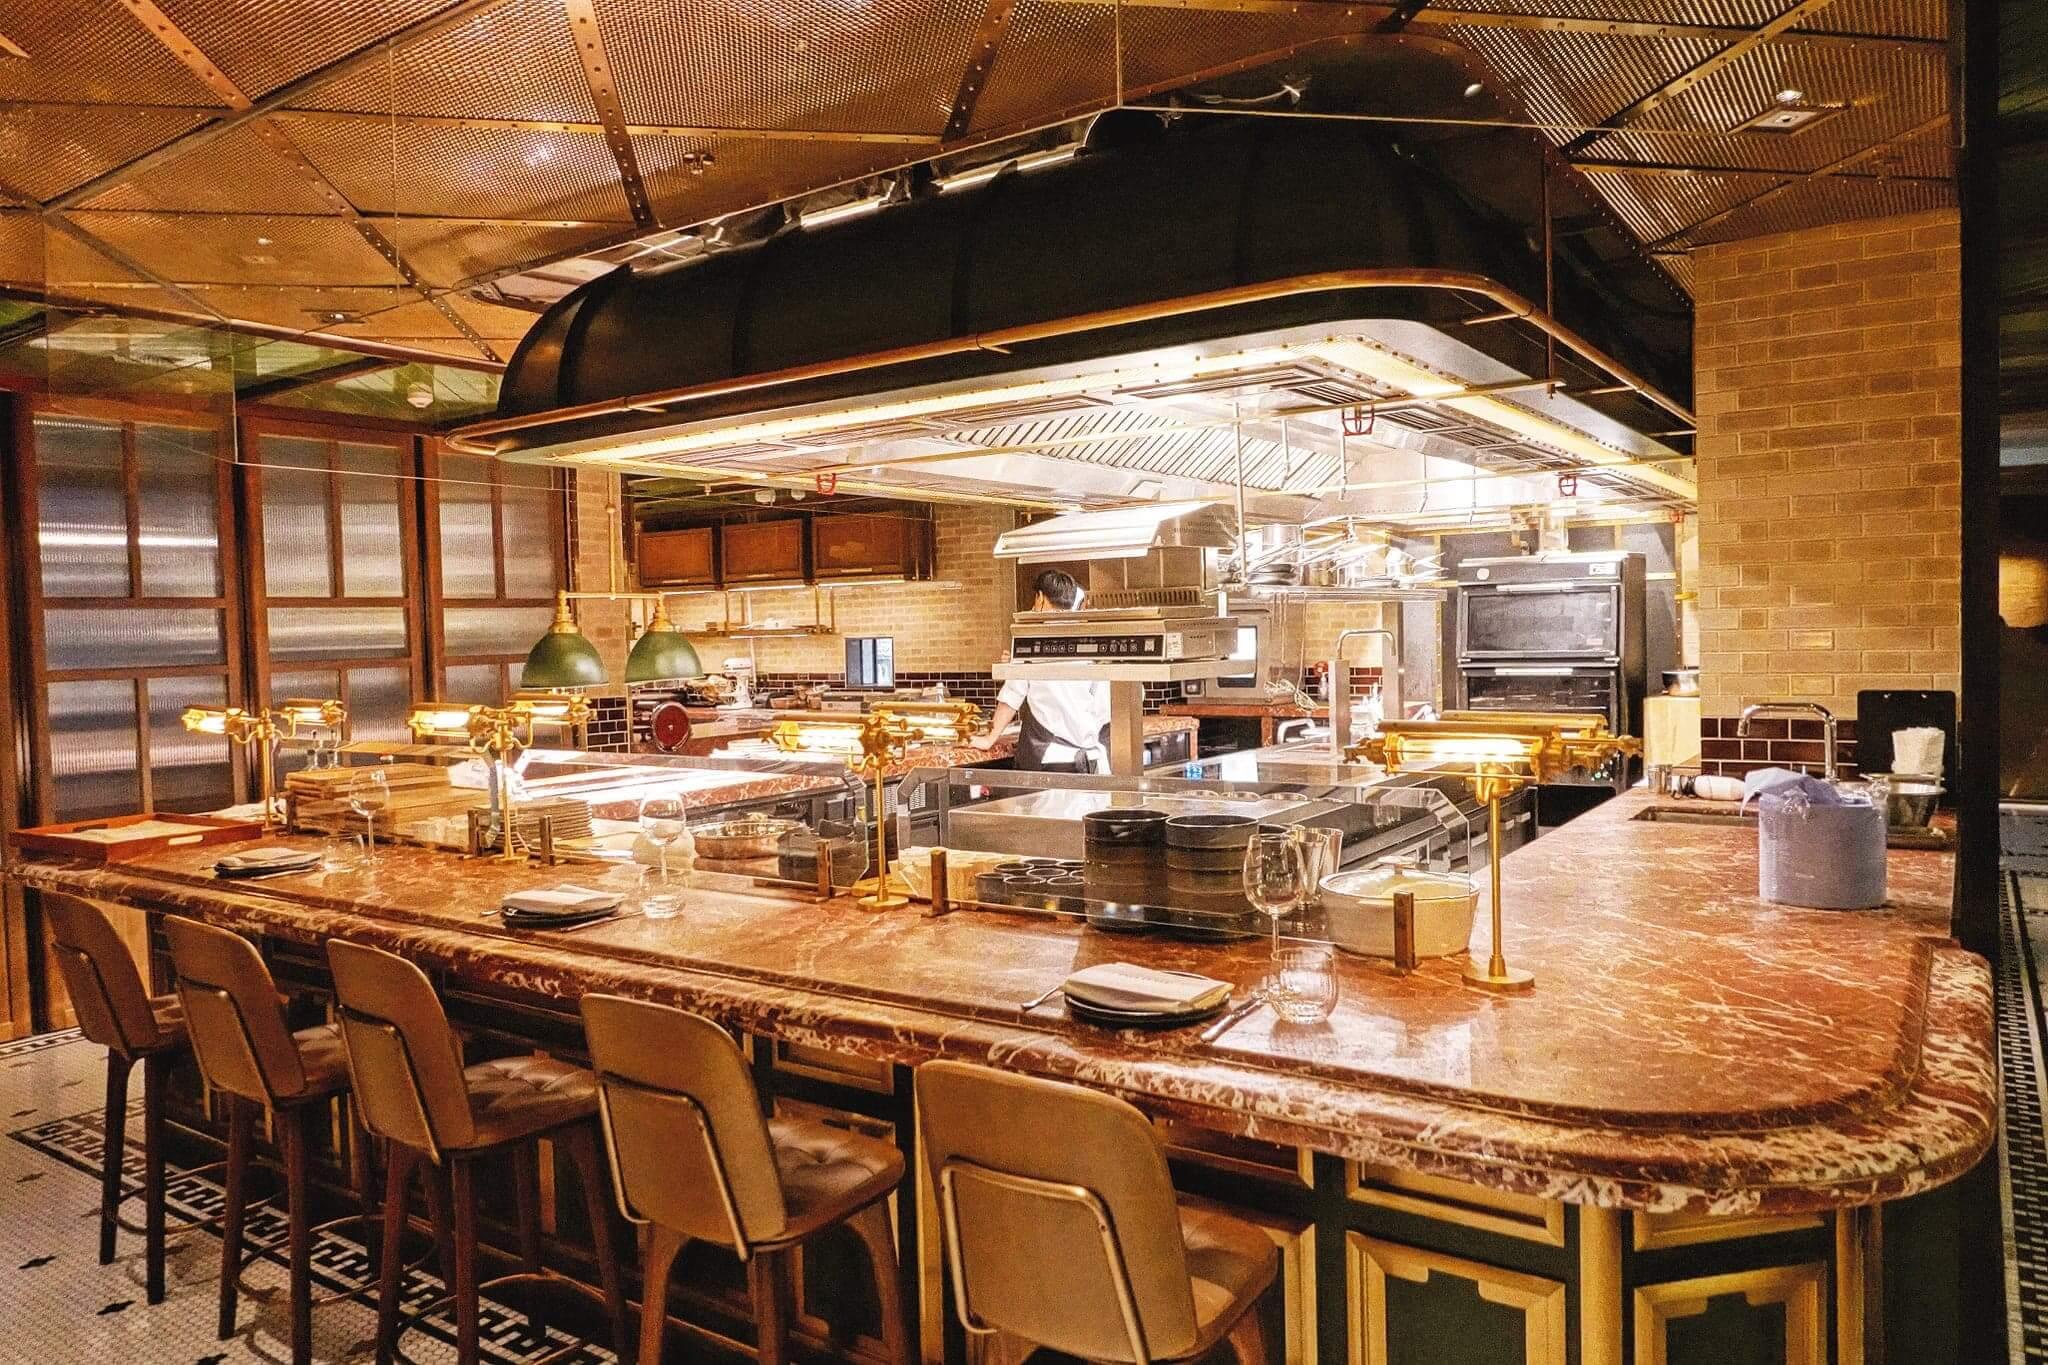 Sunset Grill裝修充滿懷舊氣息,部分座位貼近廚房,可以令客人即時嘗鮮!